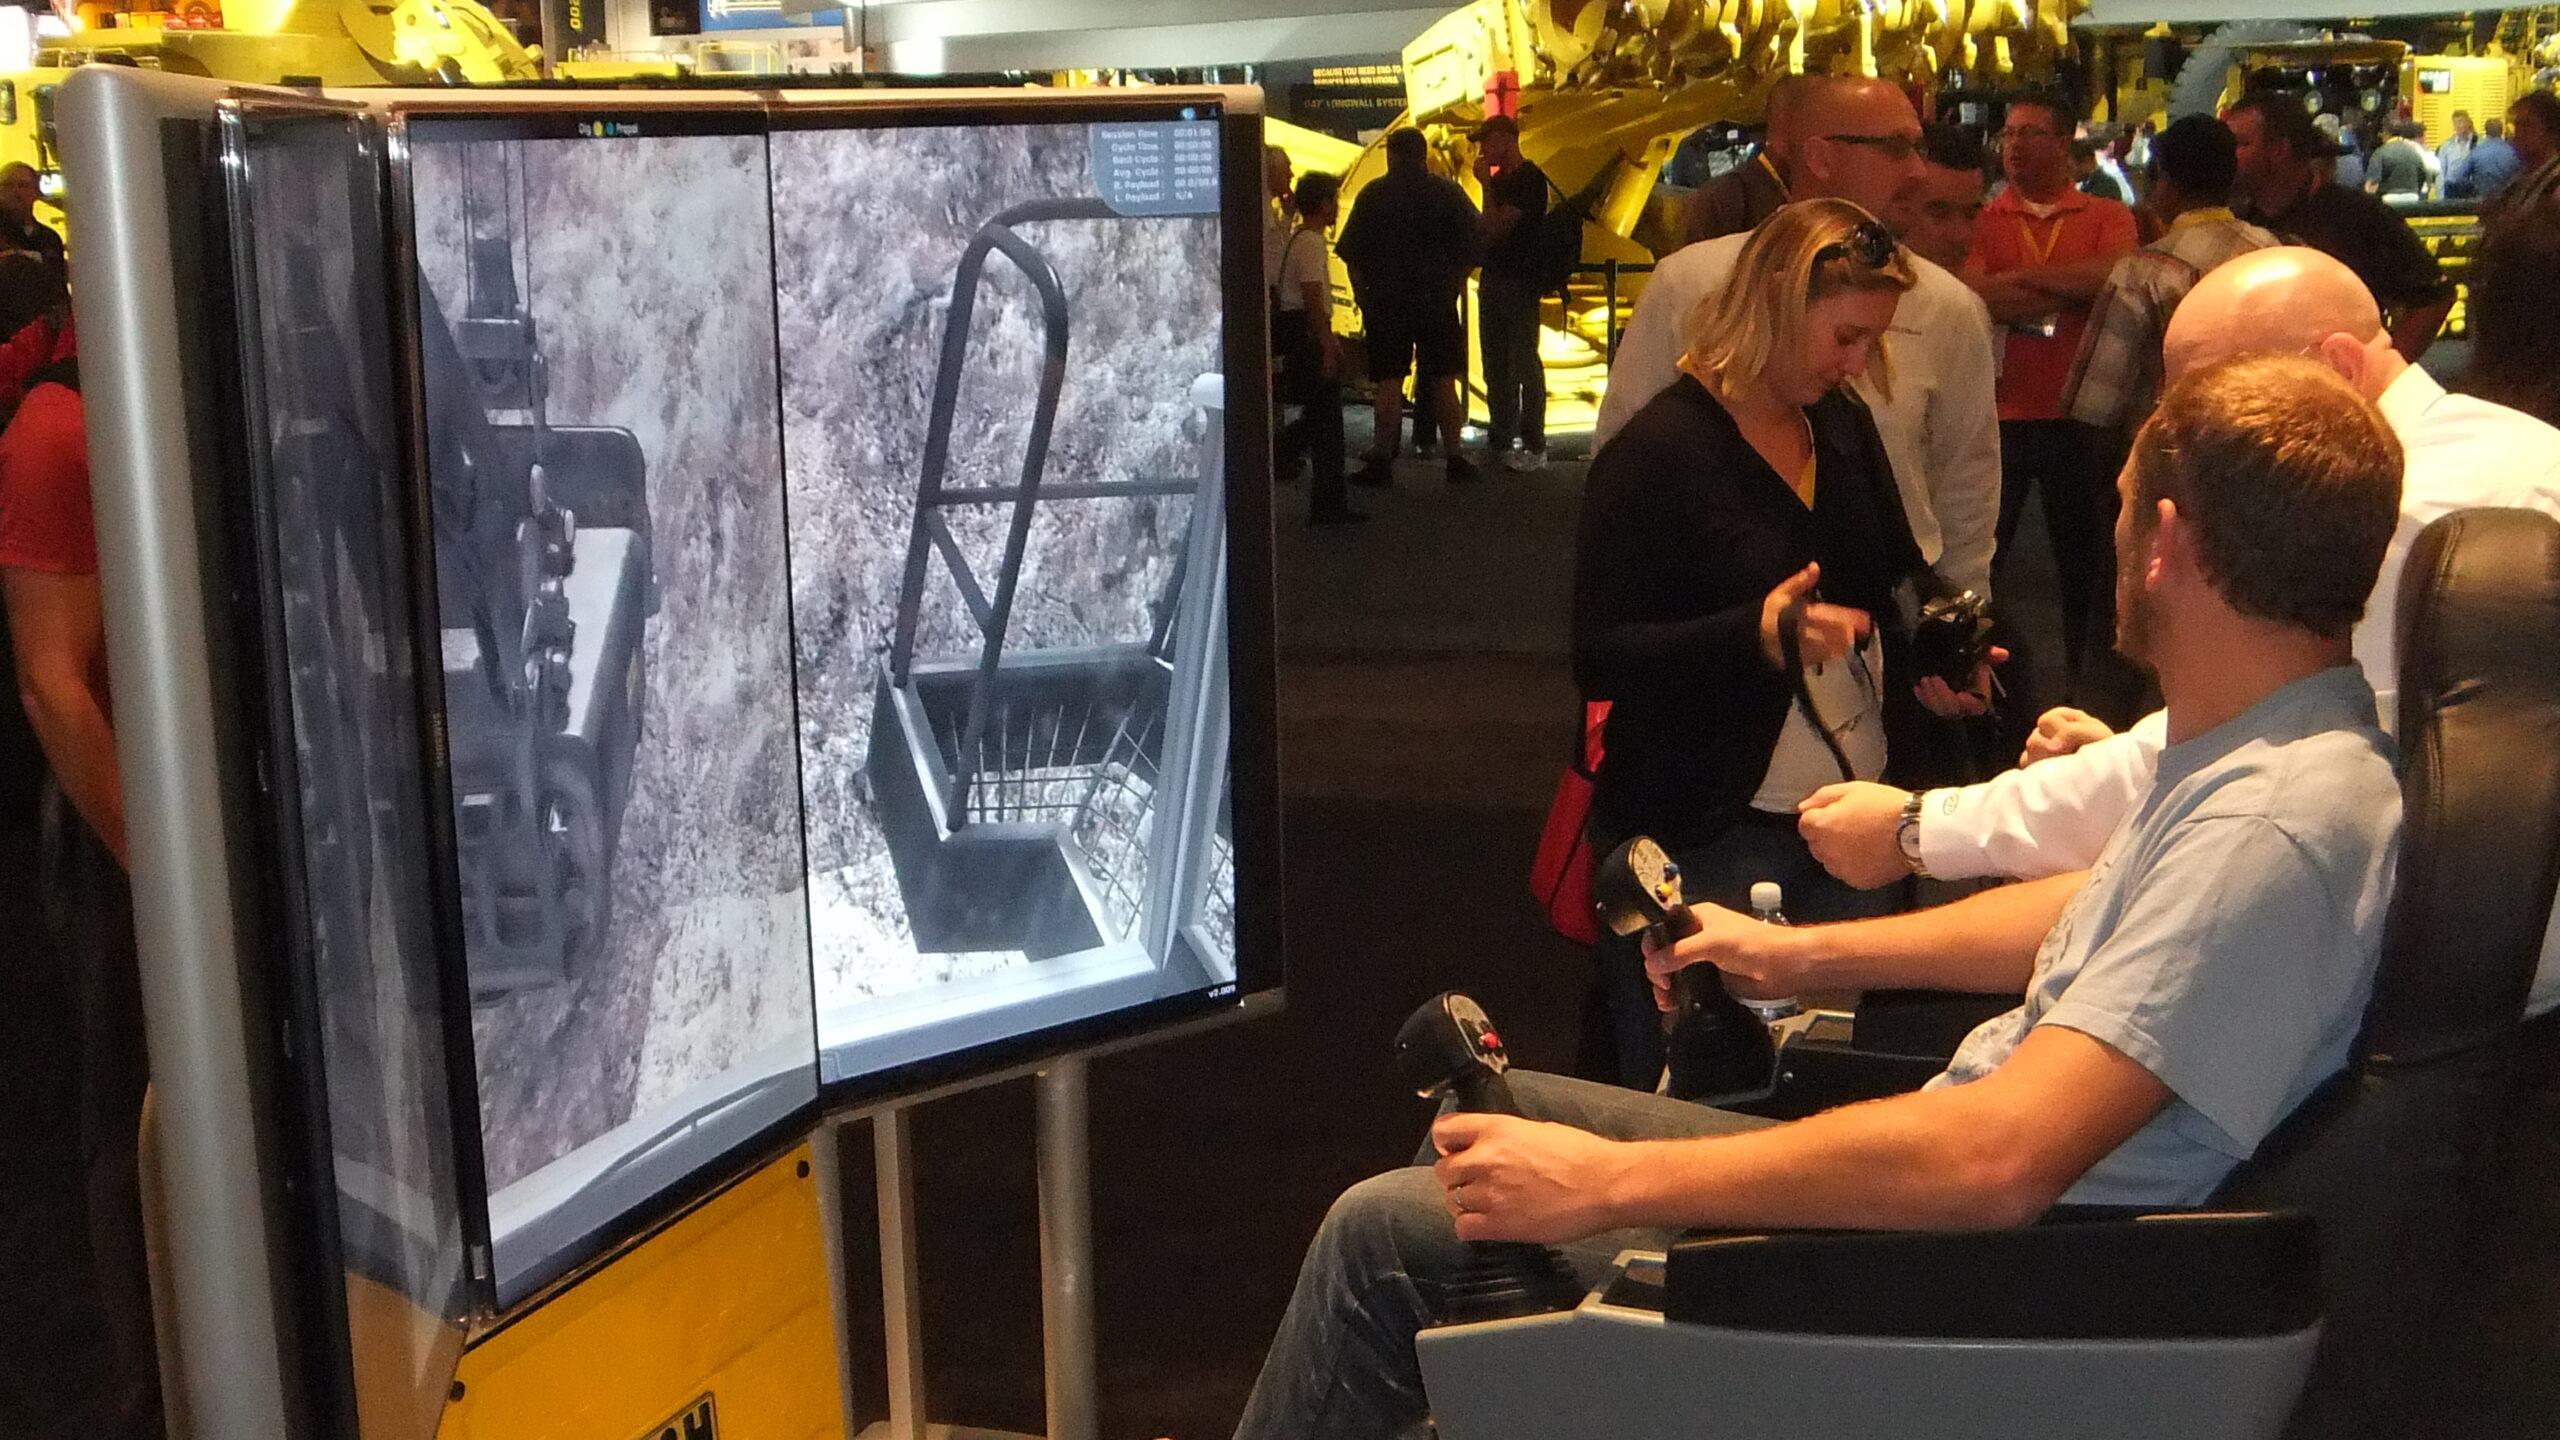 Komatsu P&H Mining Electric Rope Shovel Simulator by ForgeFX Simulations at MinExpo